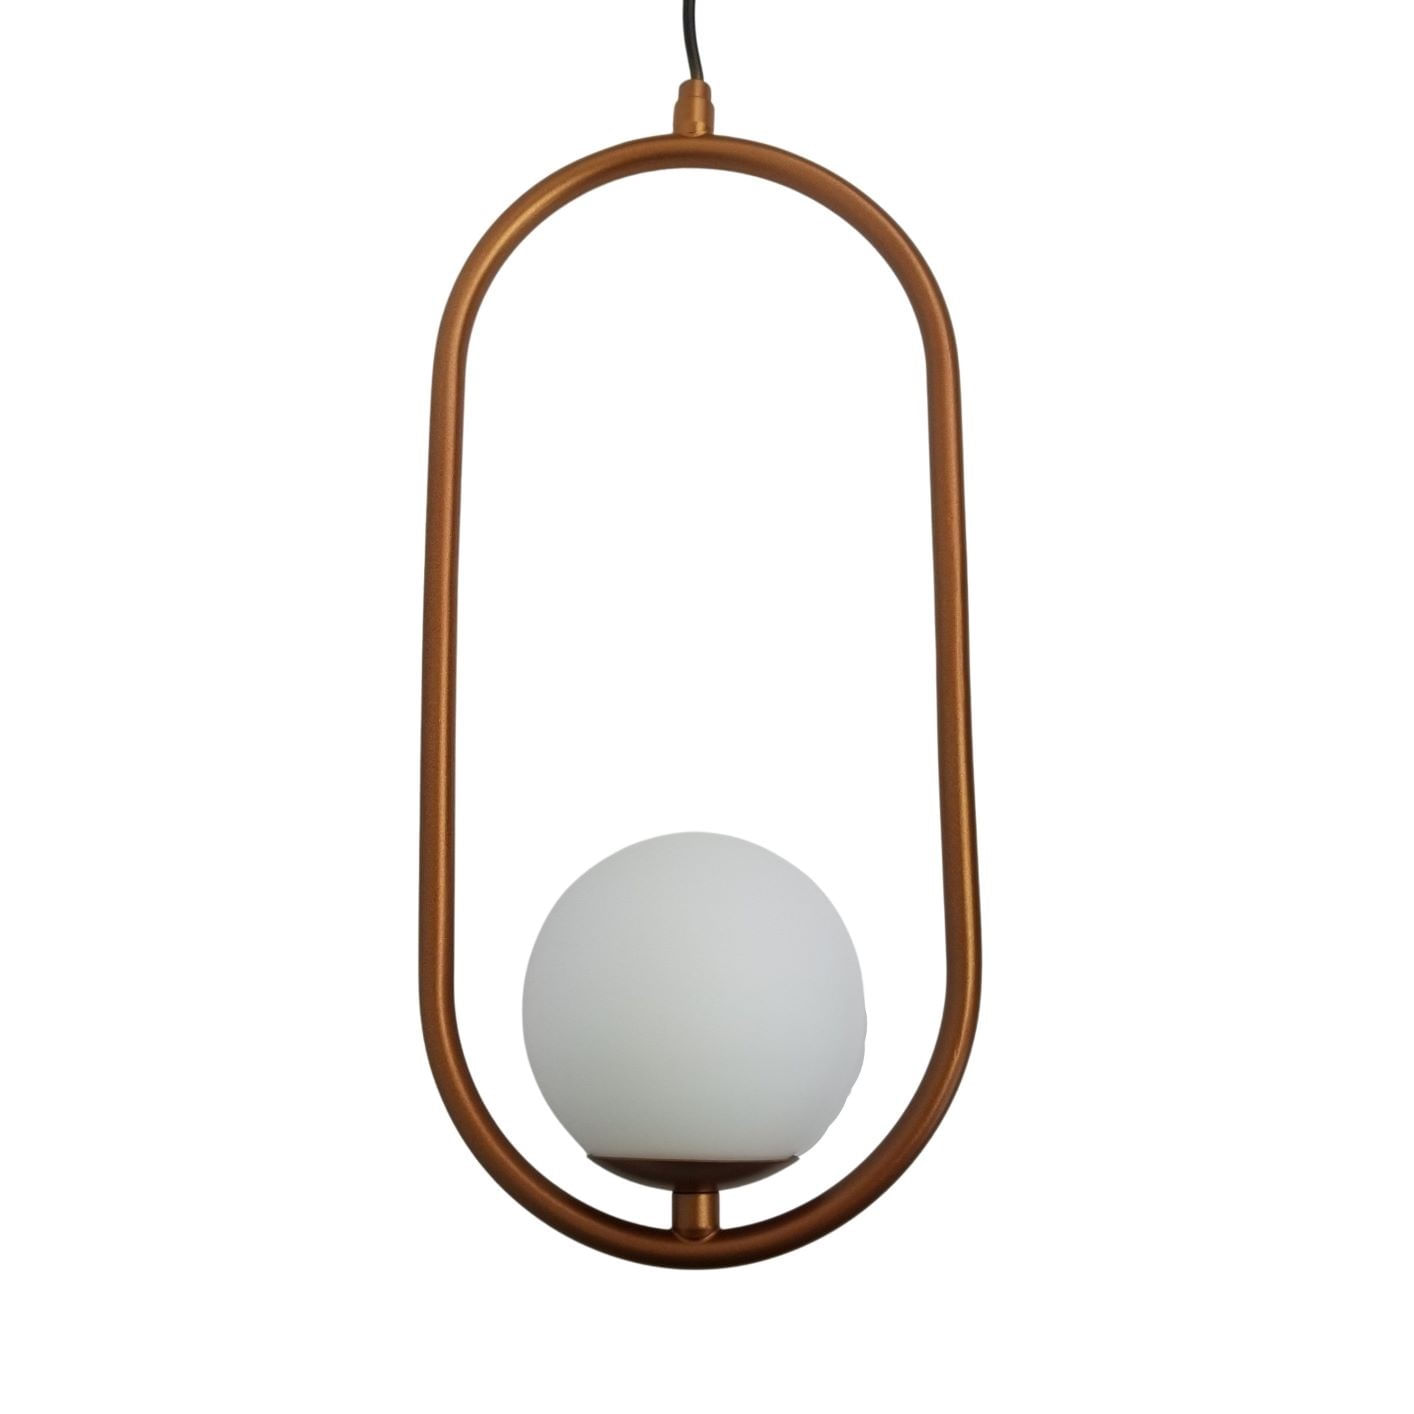 Kit 3 Pendentes Modernos Aro Oval Cobre Com Globo Branco